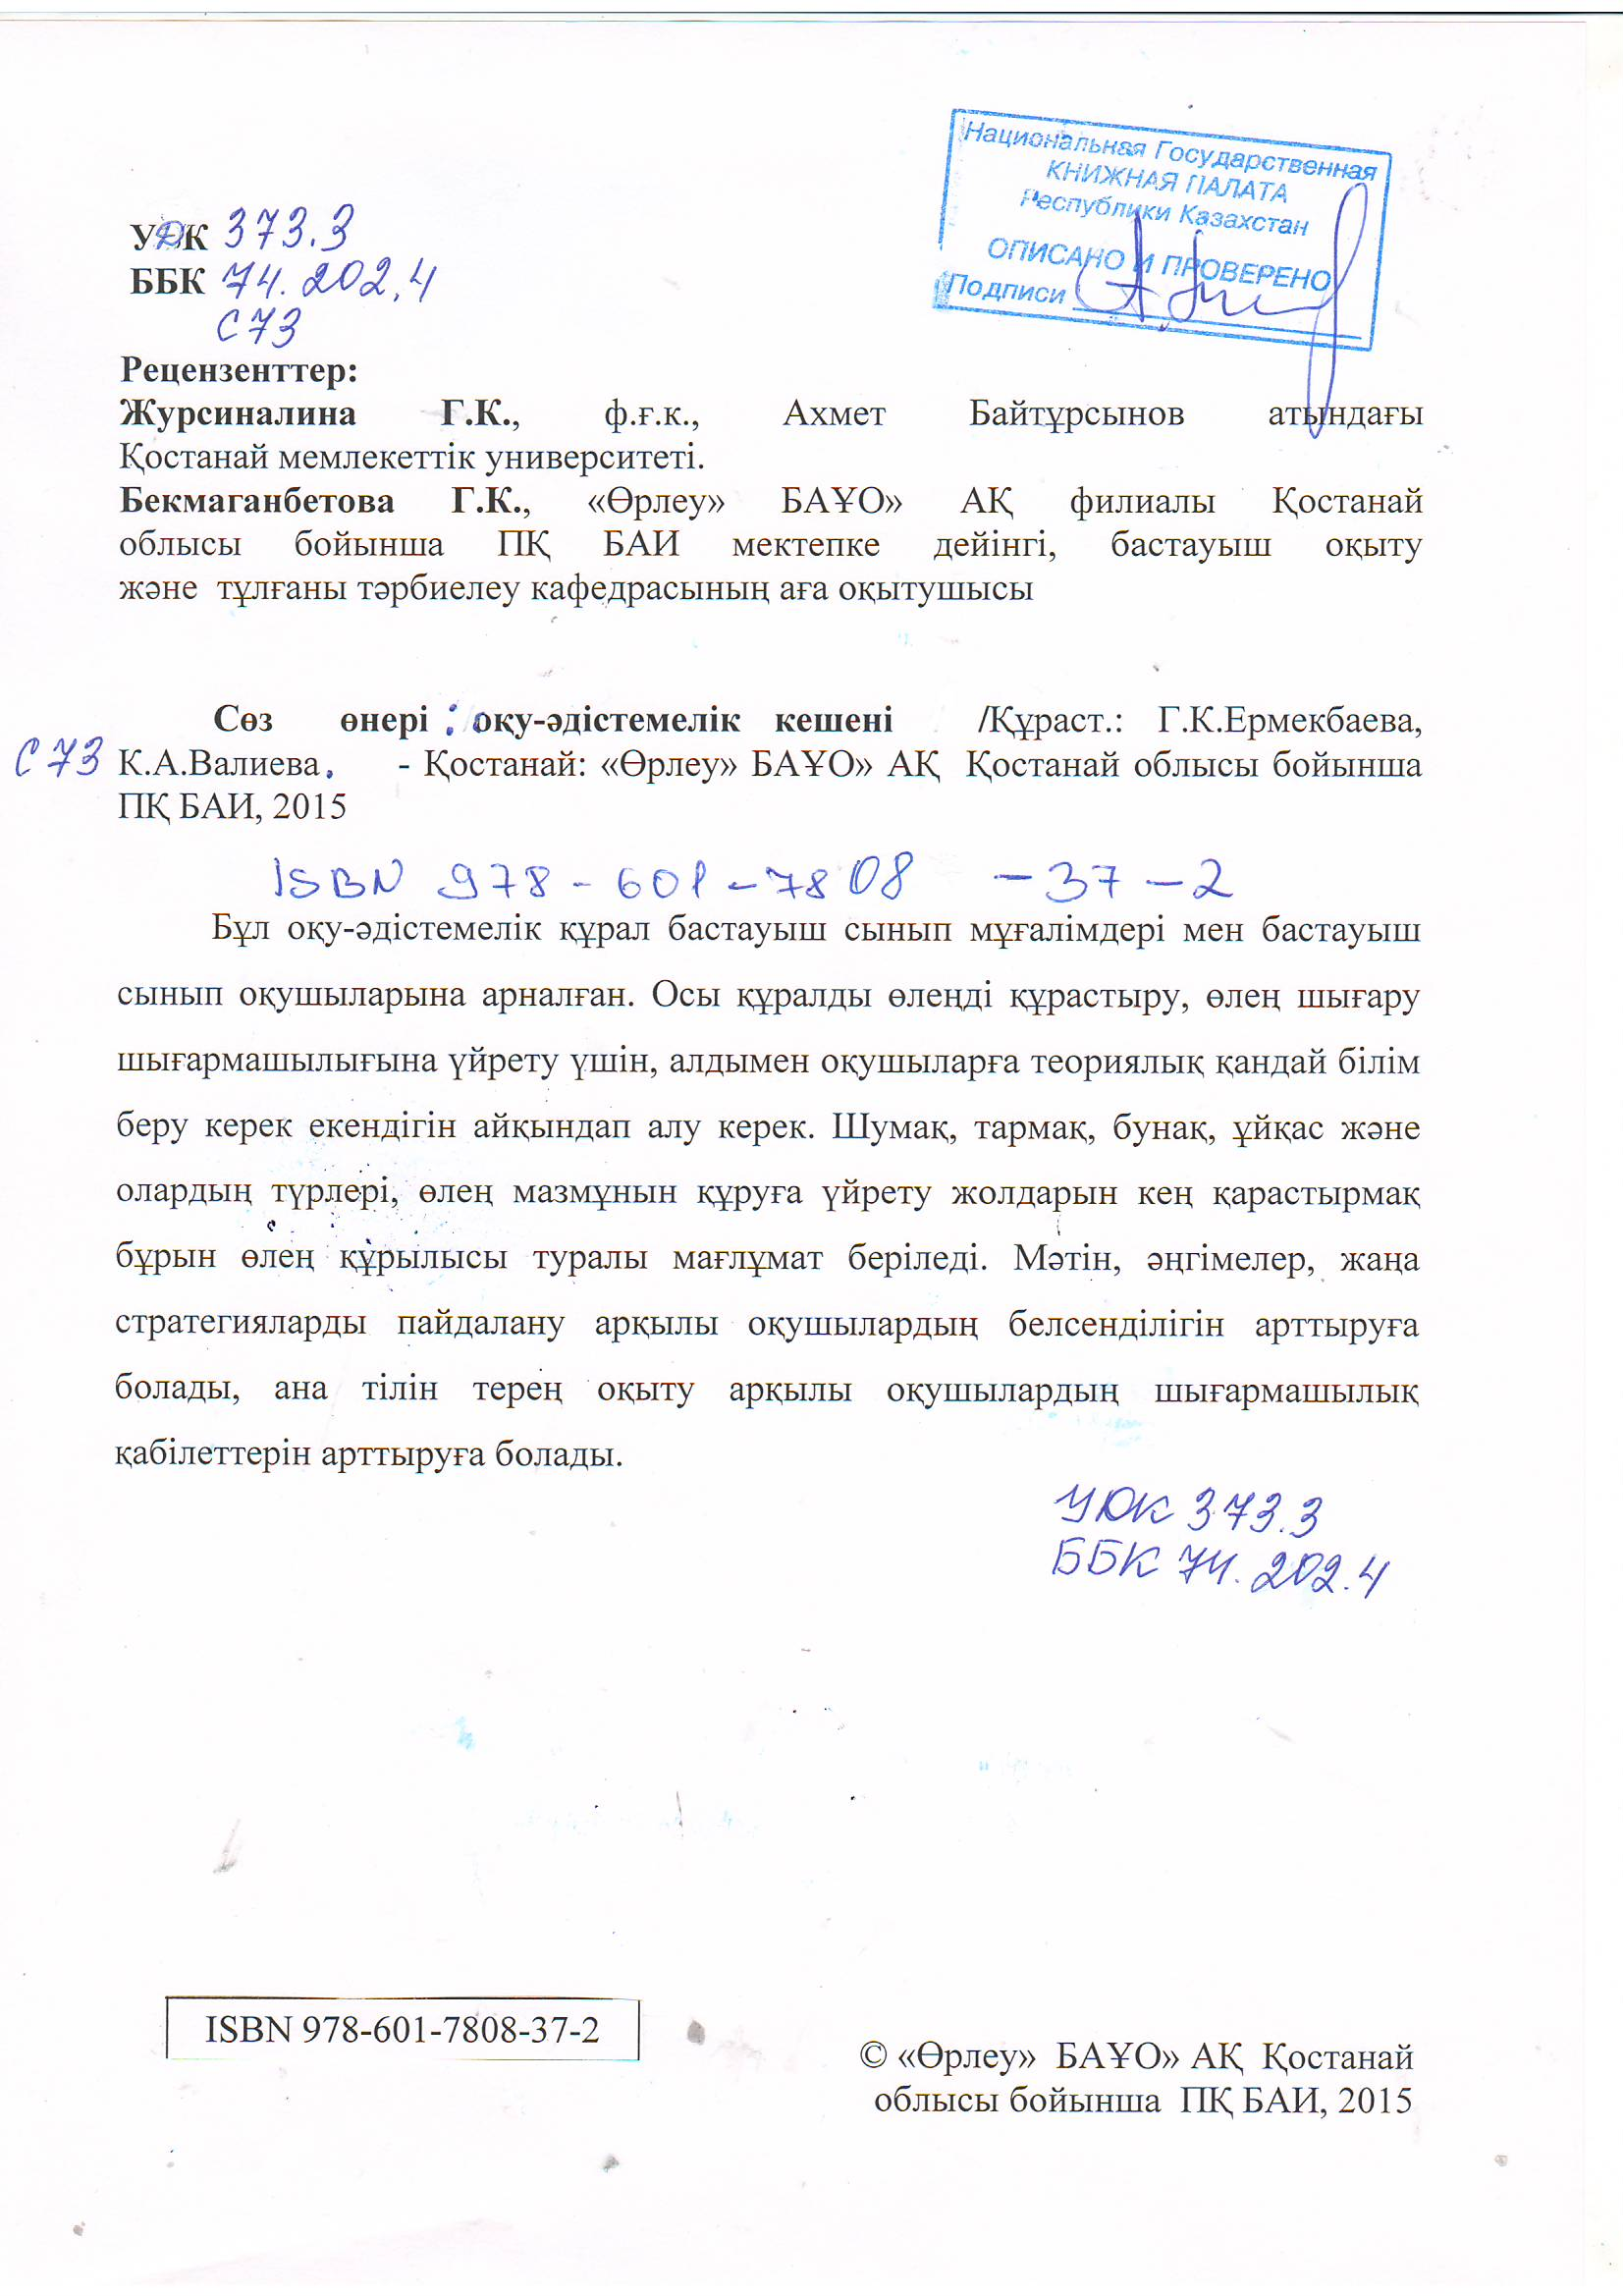 C:\Users\Lenovo\Desktop\Ермекбаева, Валиева.JPG